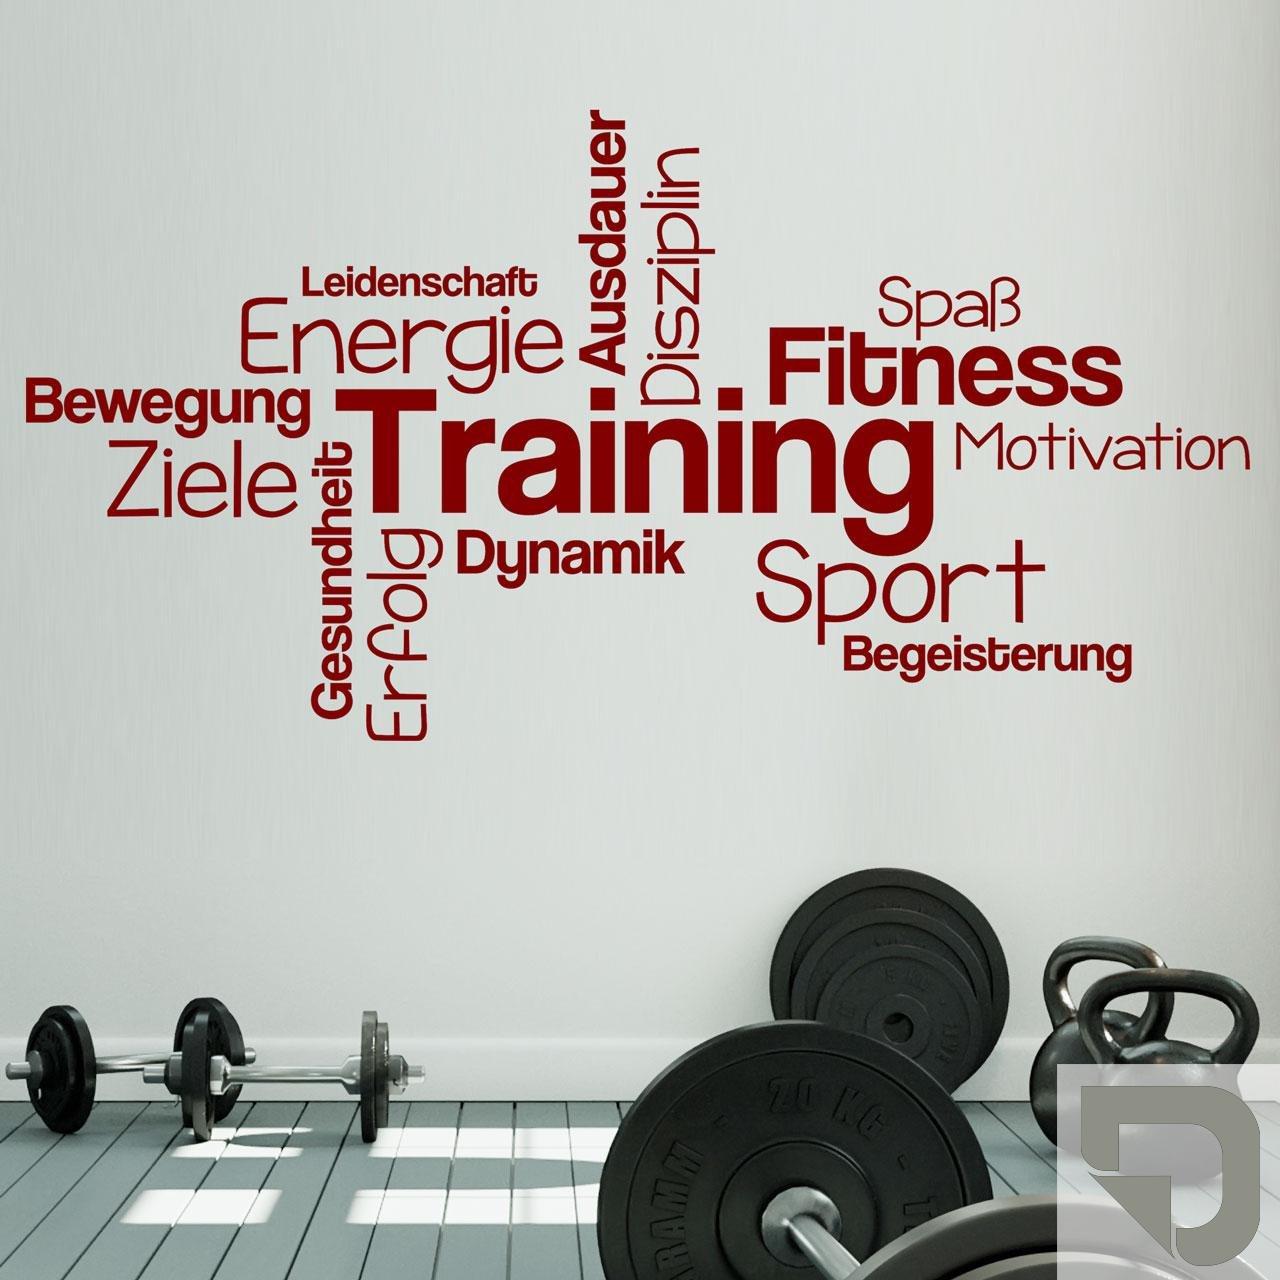 DESIGNSCAPE® Wandtattoo Training Training Training Begriffe   Wortwolke zur Motivation   Wandtattoo Sport 120 x 62 cm (Breite x Höhe) dunkelrot DW803439-M-F21 B071KVHBZ9 Wandtattoos & Wandbilder 2cff00